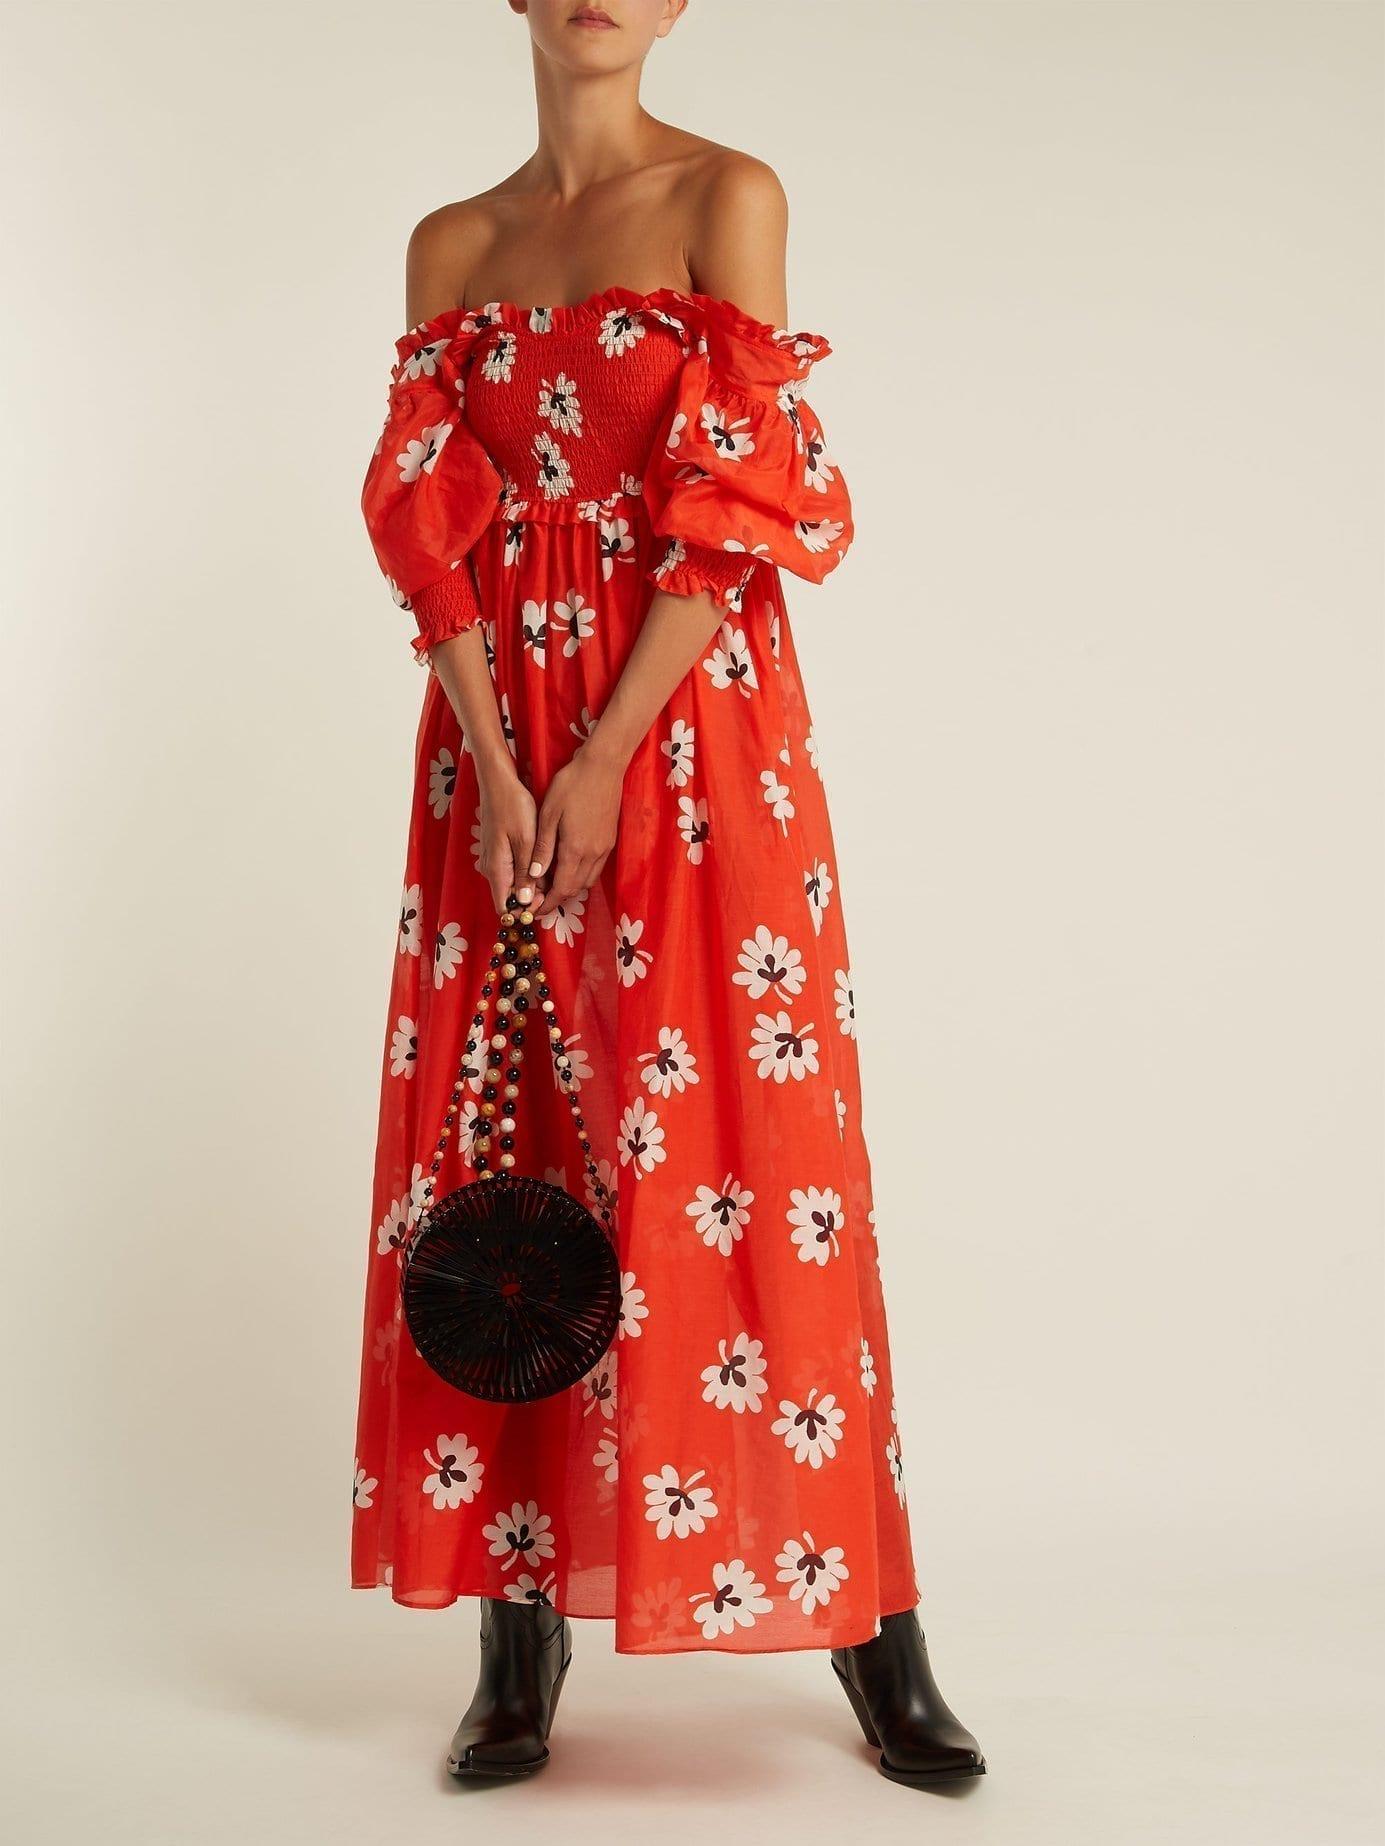 GANNI Linaria Red / Floral Printed Dress